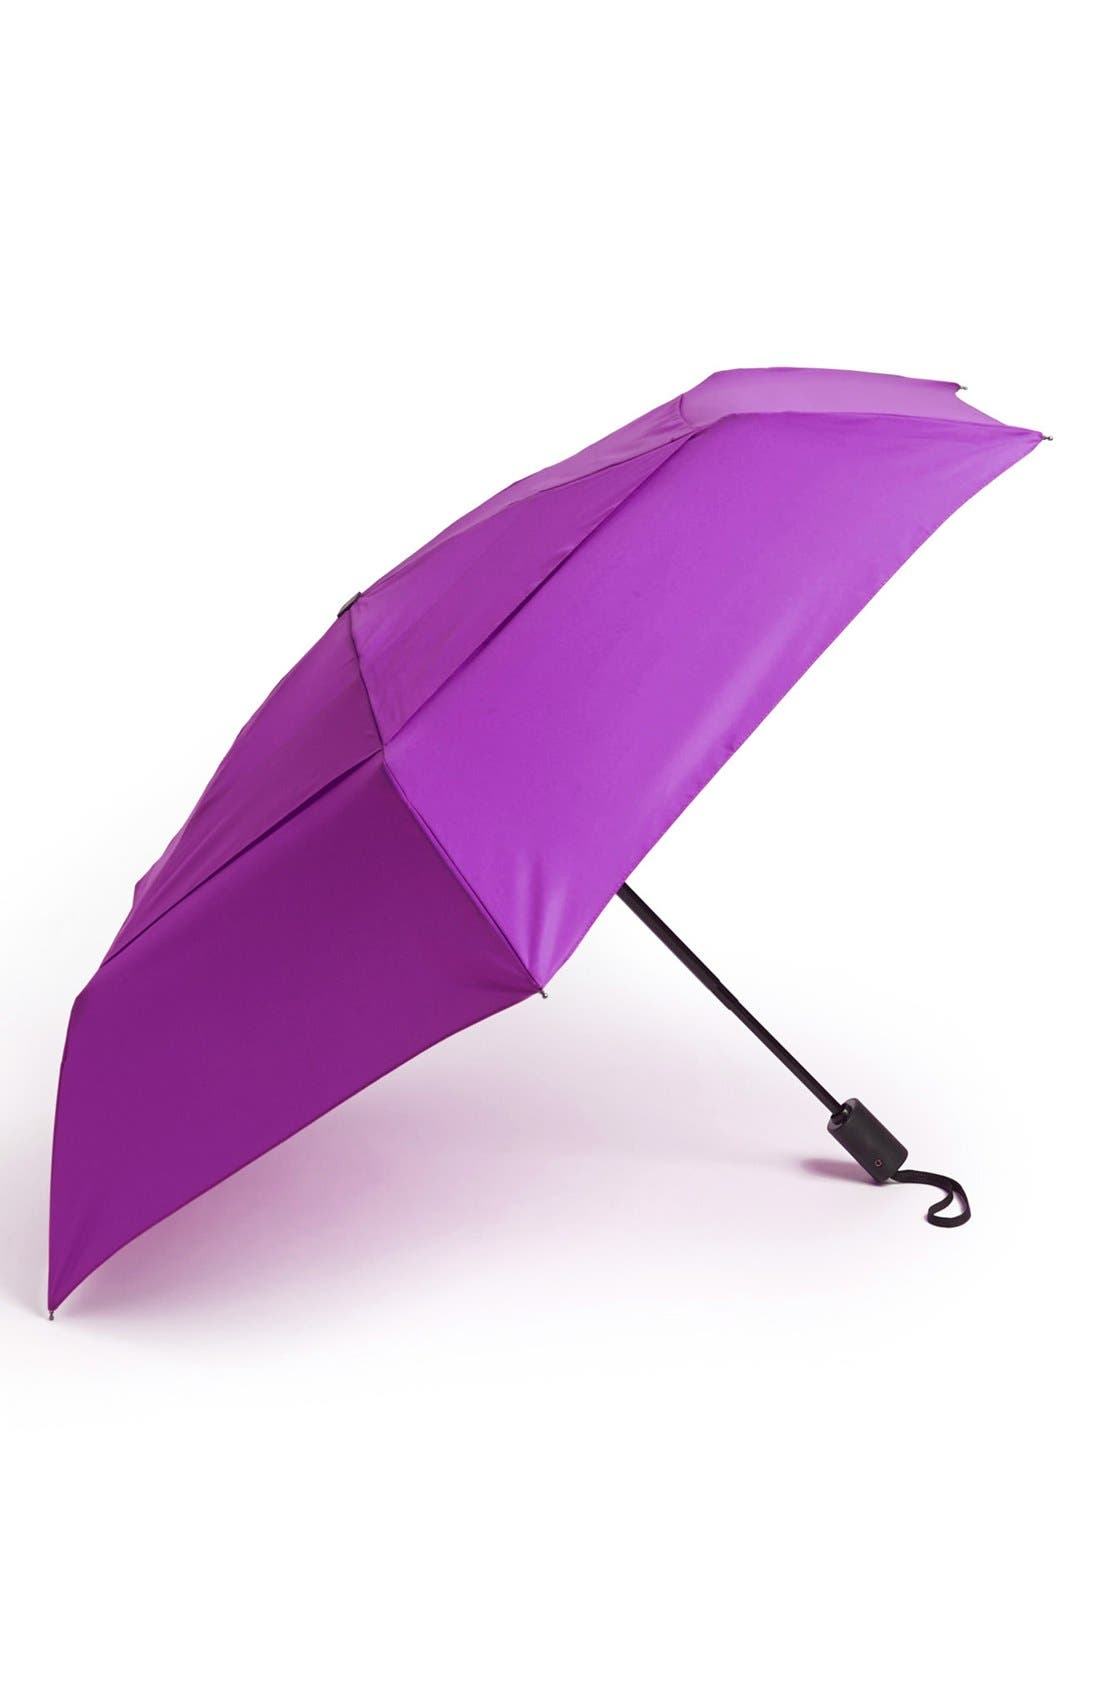 'WindPro<sup>®</sup>' Auto Open & Close Umbrella,                             Main thumbnail 1, color,                             HYACINTH